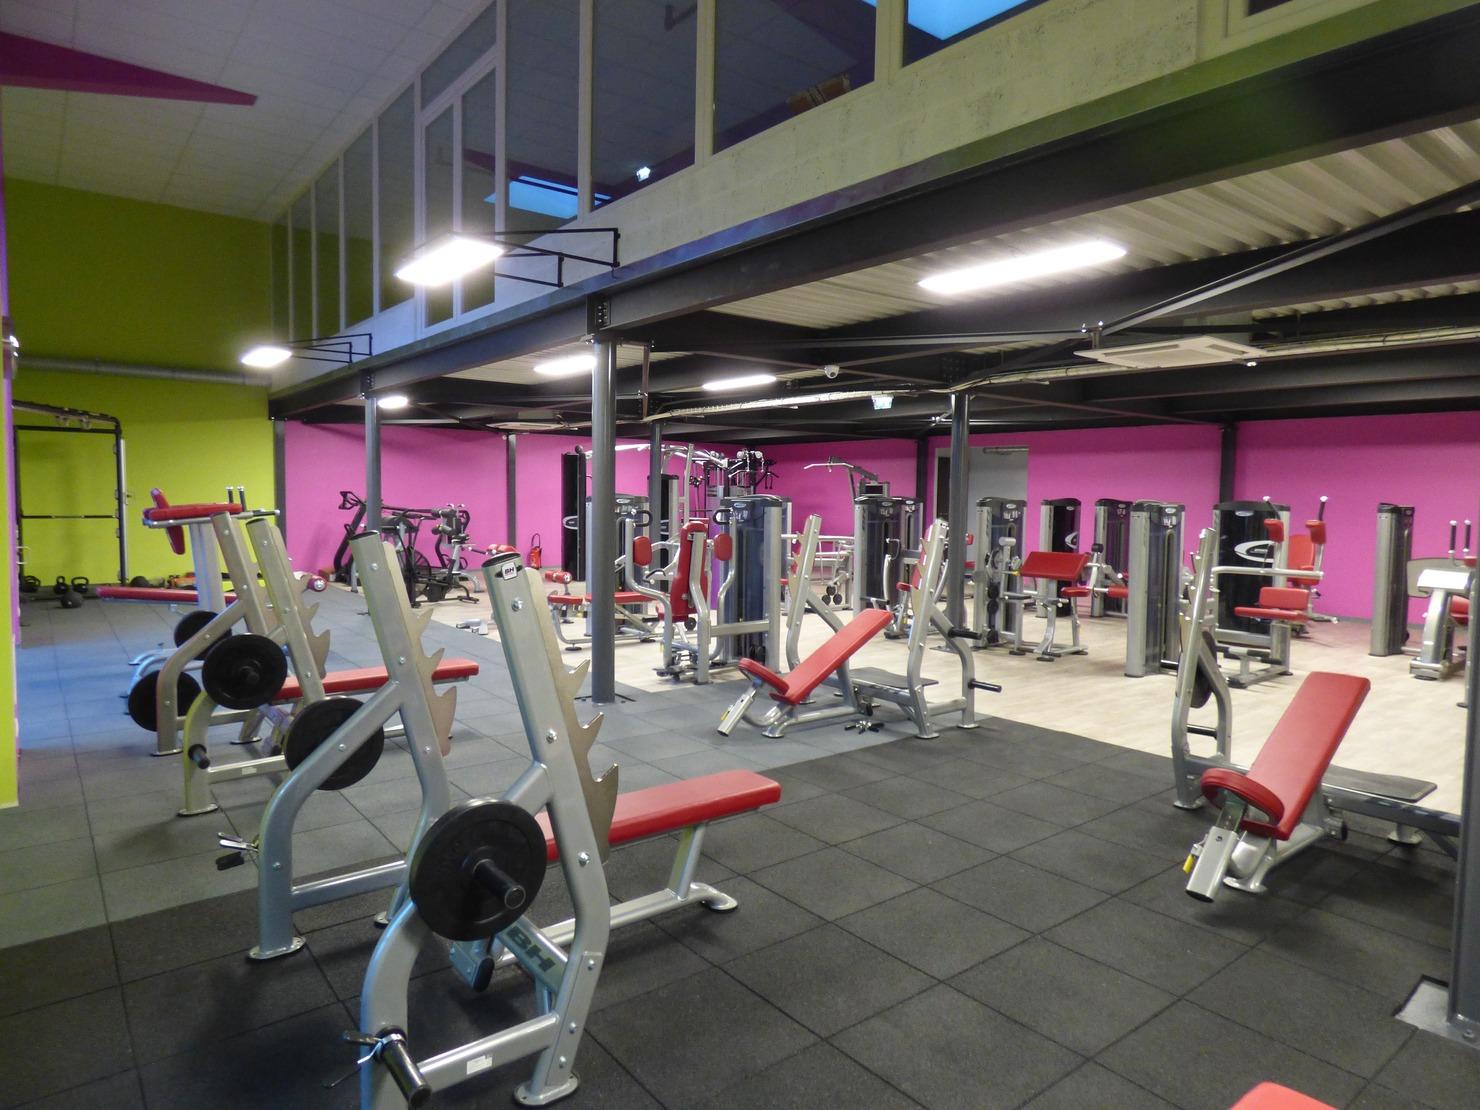 Fitness Club Concept Obernai Tarifs Avis Horaires Offre